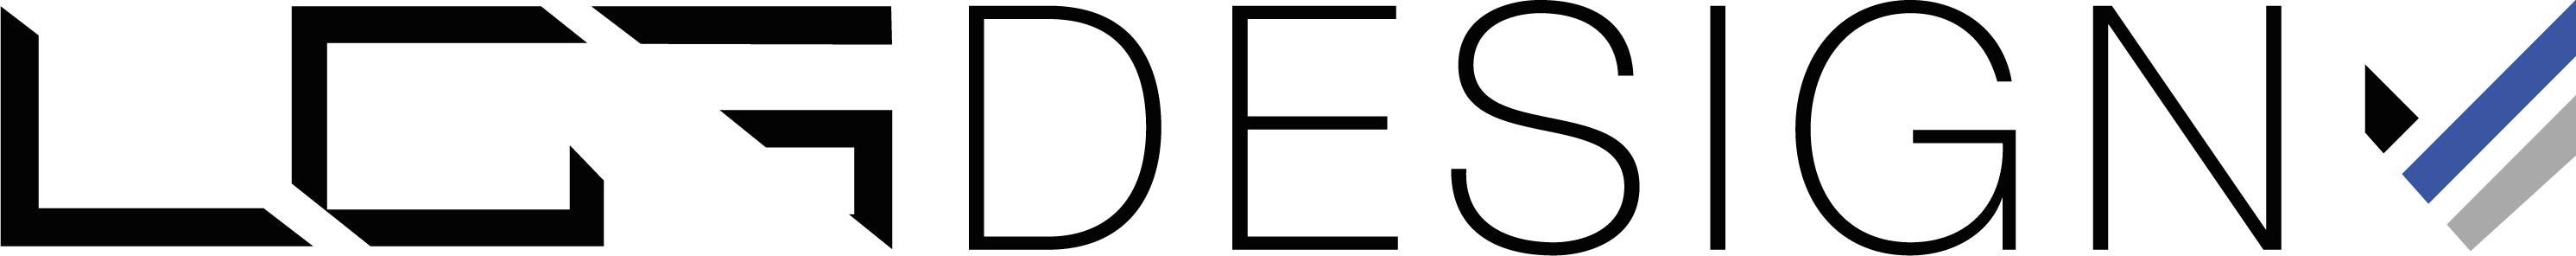 2019_fb_logo